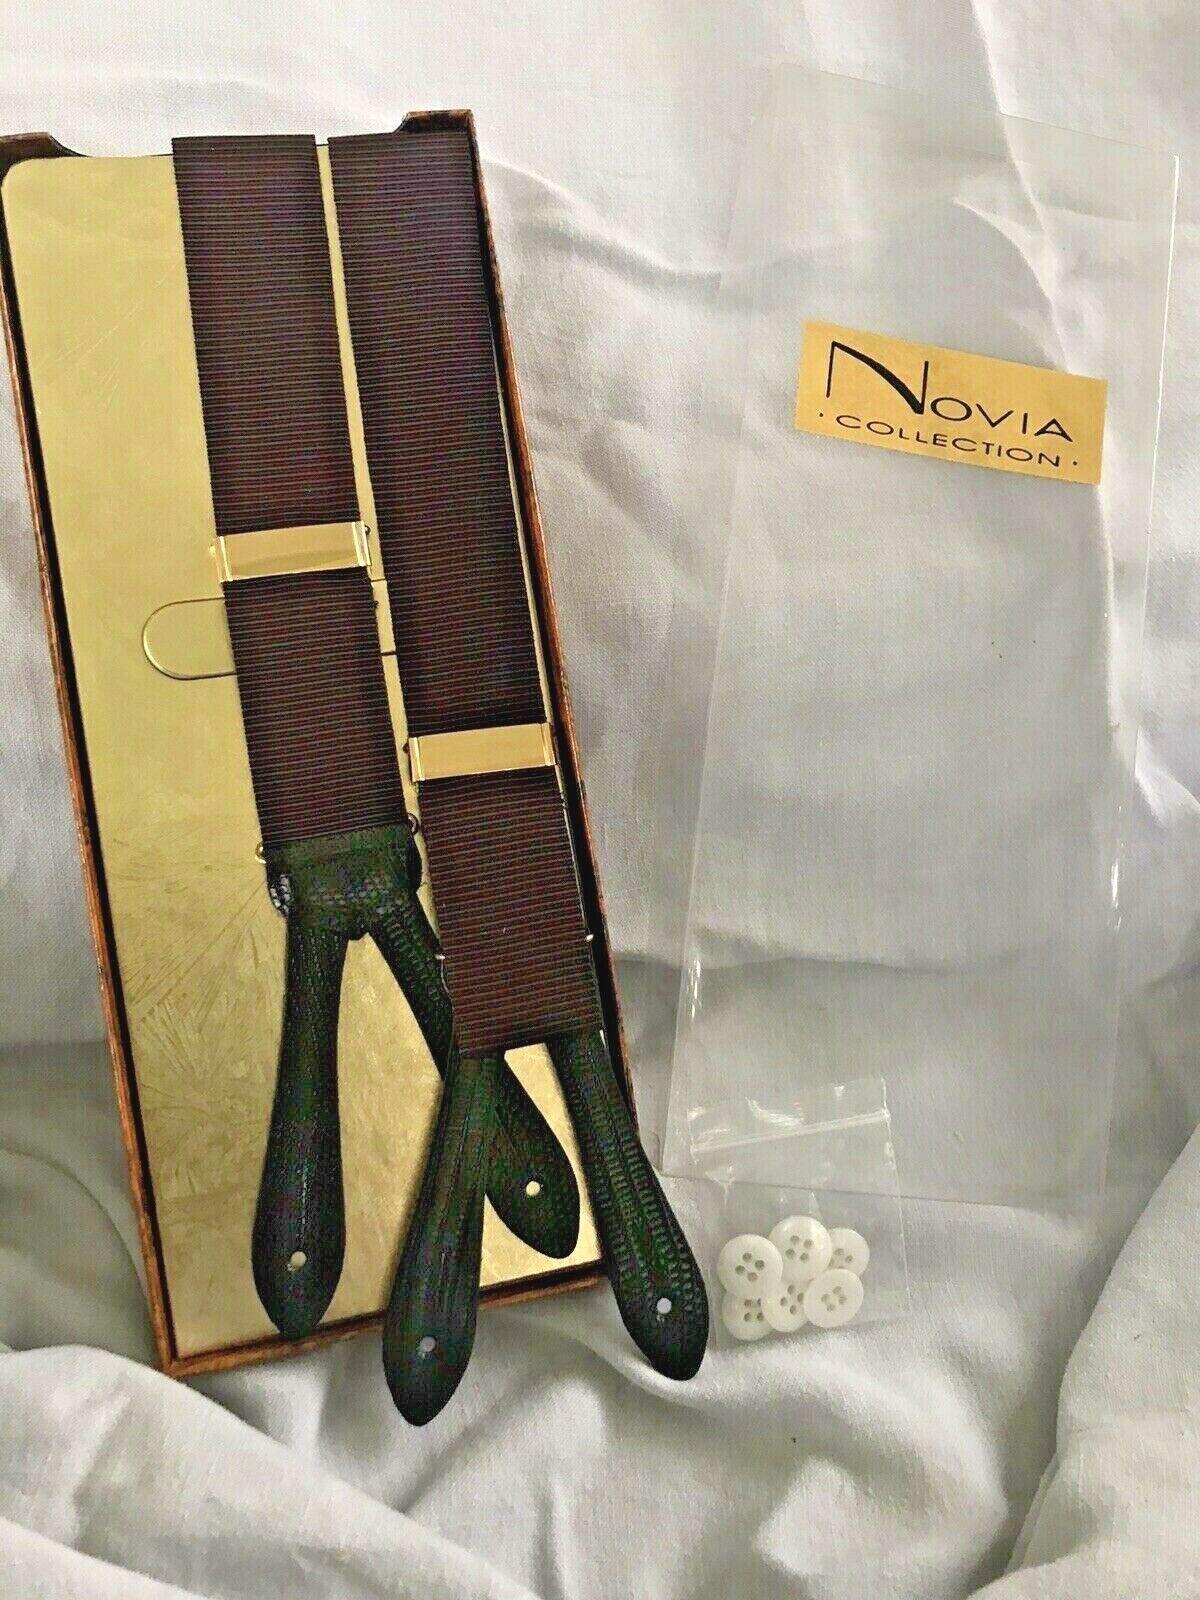 Novia Collection Suspenders Burgundy Black Adjustable Button Style NIB